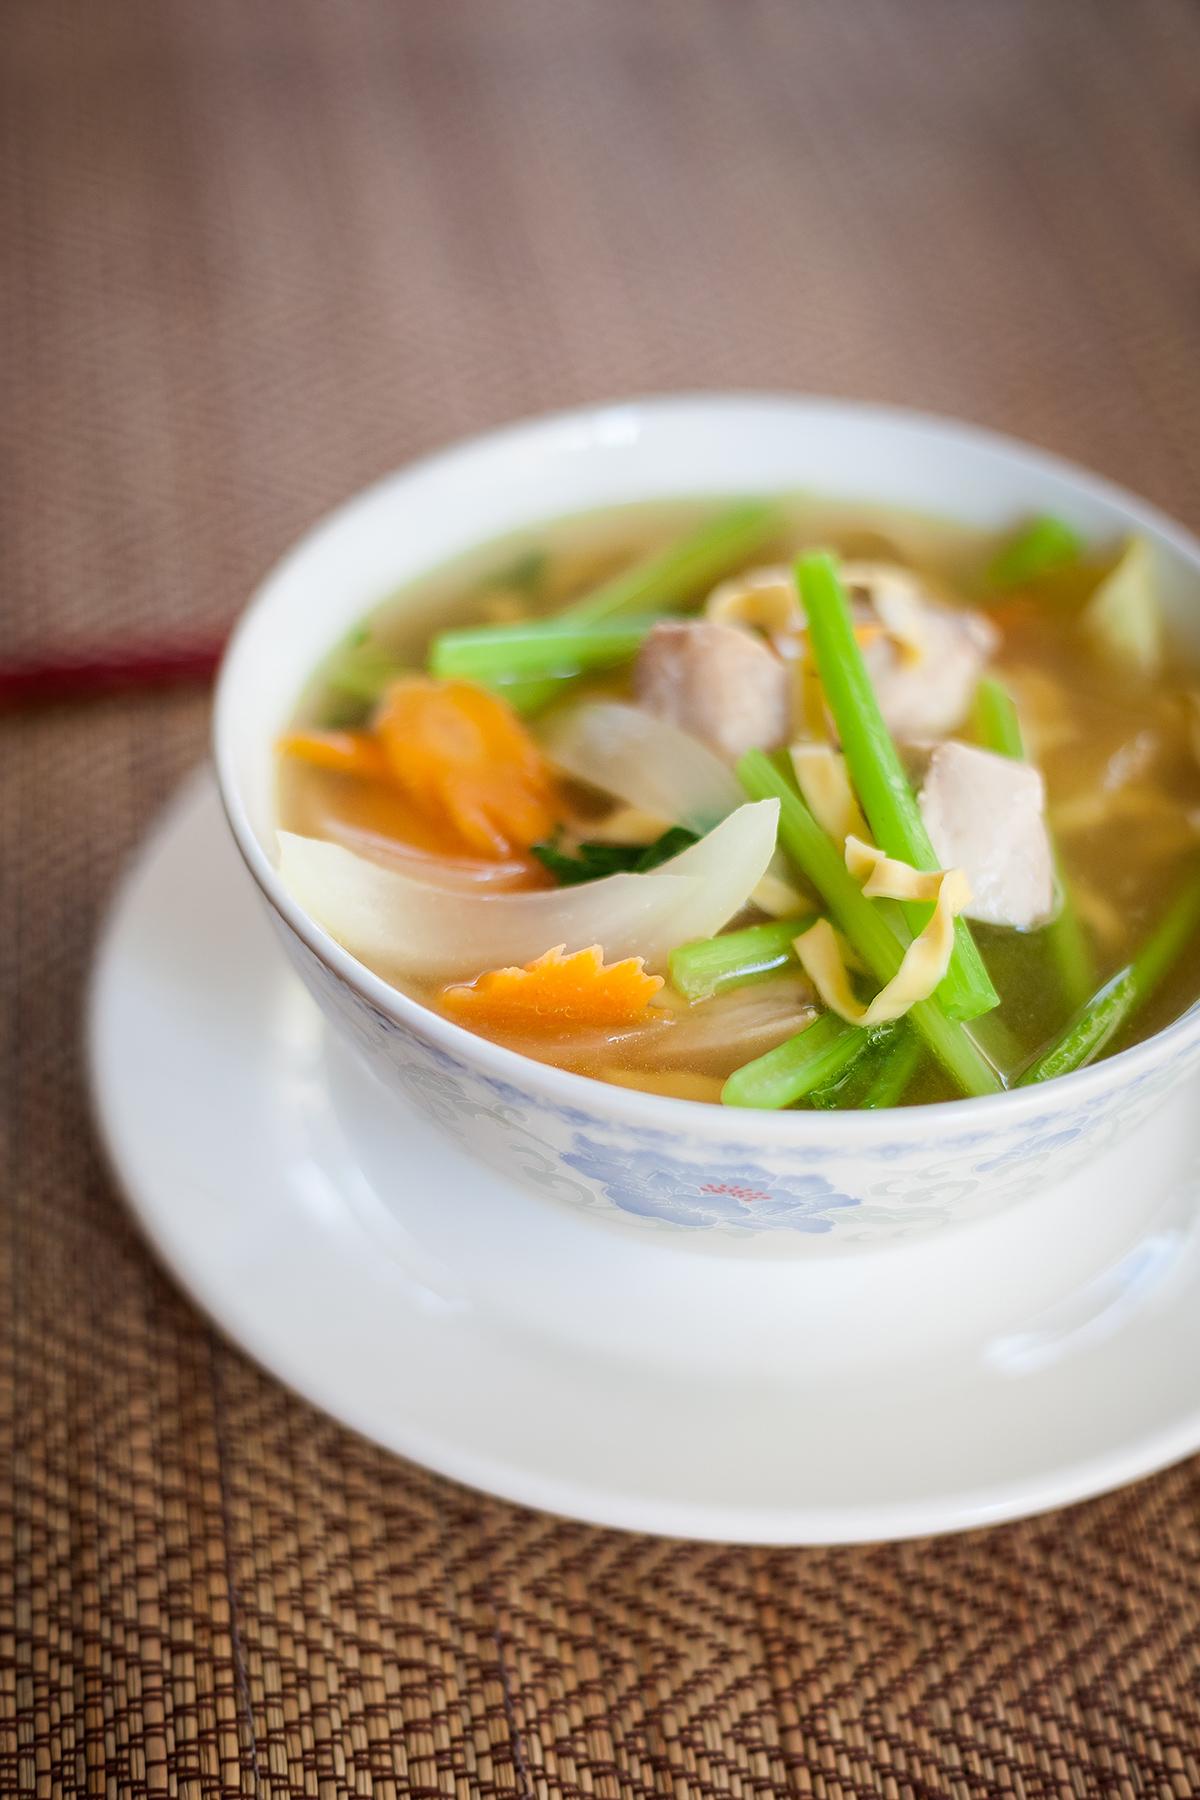 fotografia kulinarna slask kambodza 4 Kuchnia azjatycka   fotografia kulinarna